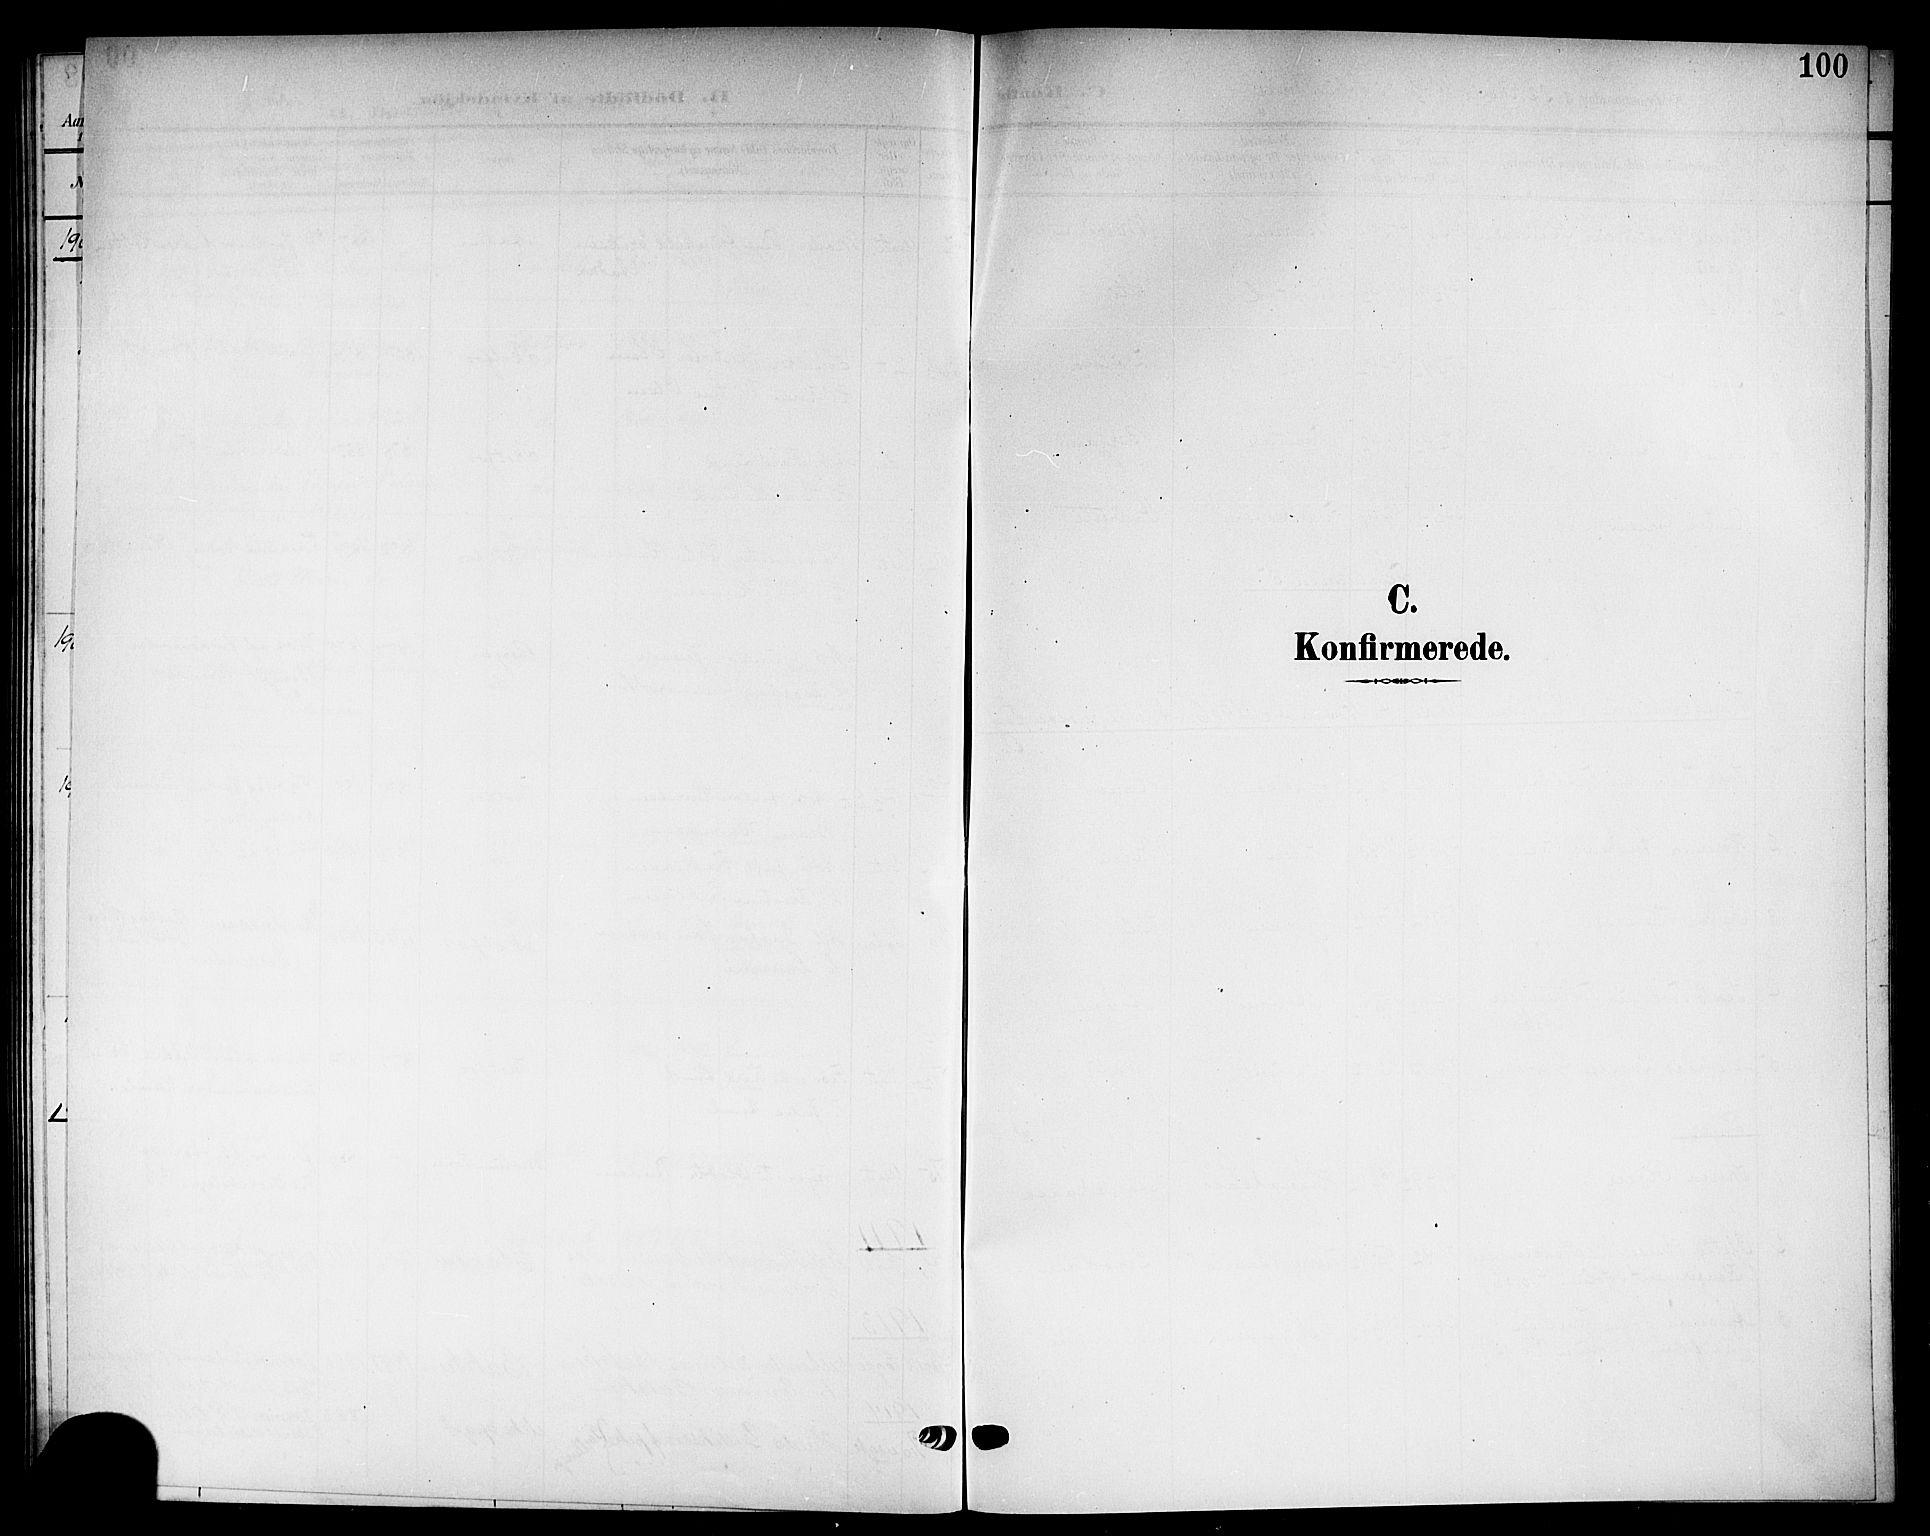 SAKO, Solum kirkebøker, G/Gb/L0005: Klokkerbok nr. II 5, 1905-1914, s. 100